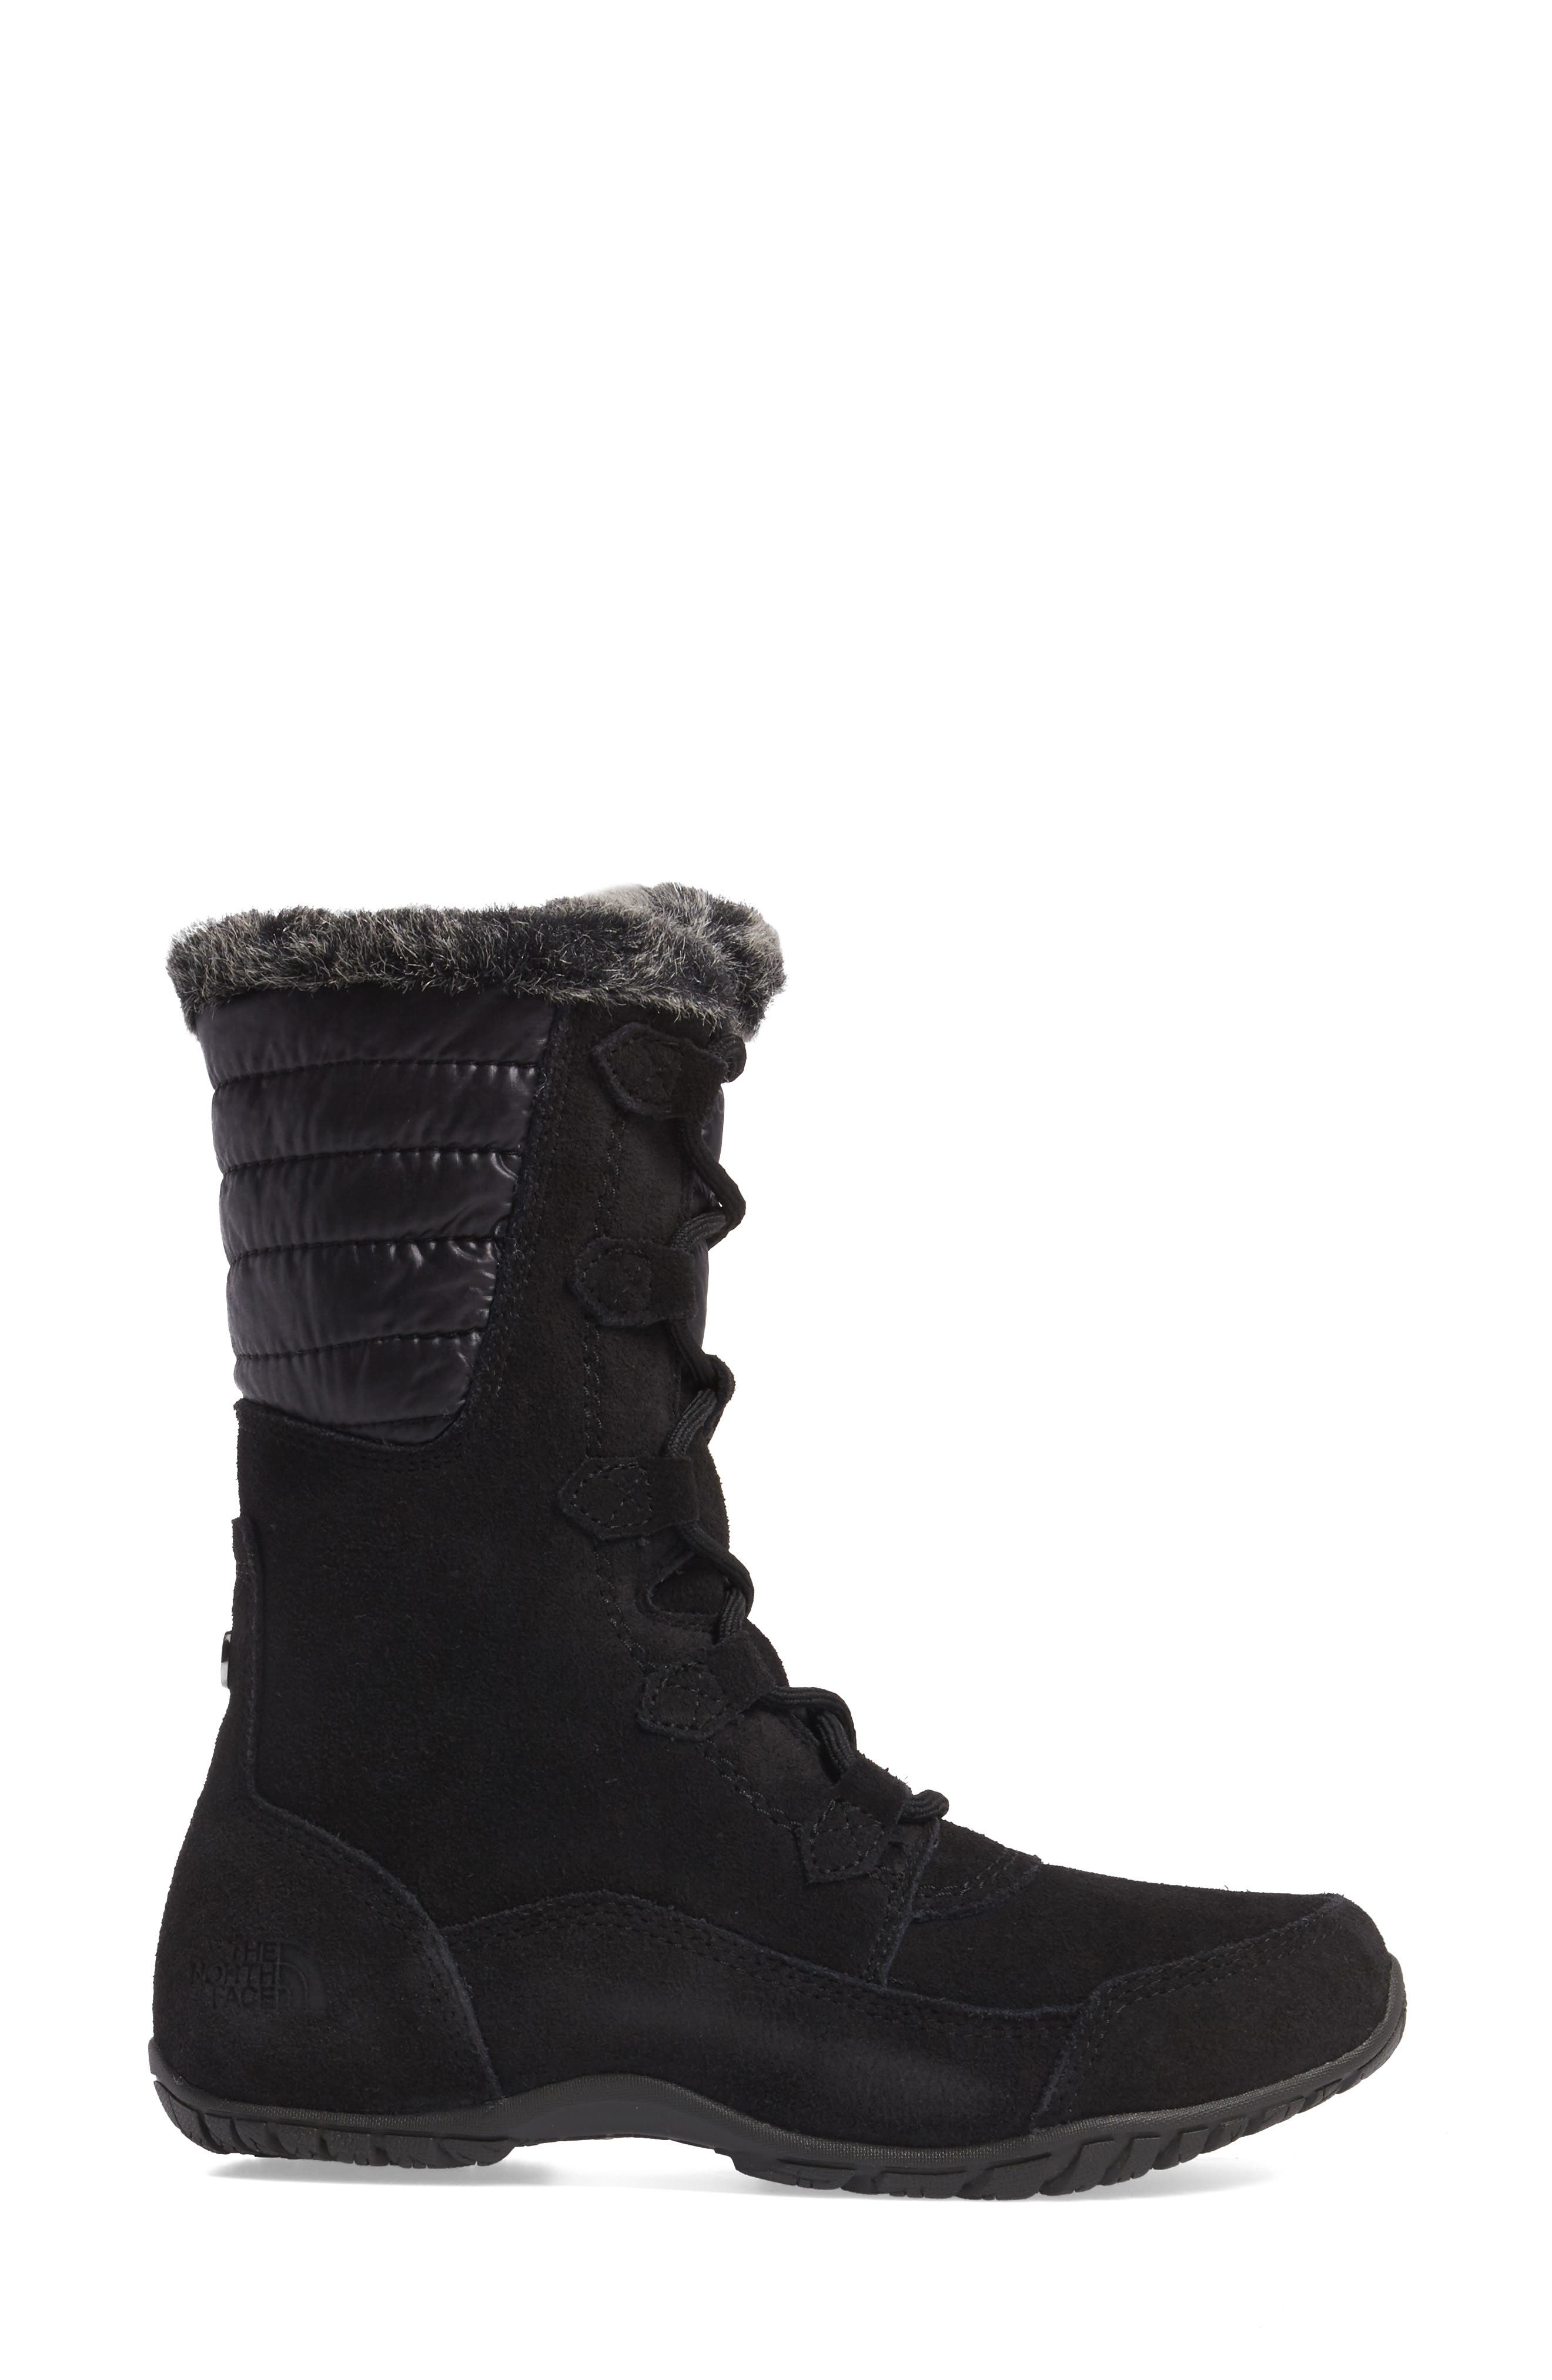 Nuptse Purna II Waterproof PrimaLoft<sup>®</sup> Silver Eco Insulated Winter Boot,                             Alternate thumbnail 3, color,                             Tnf Black/ Beluga Grey